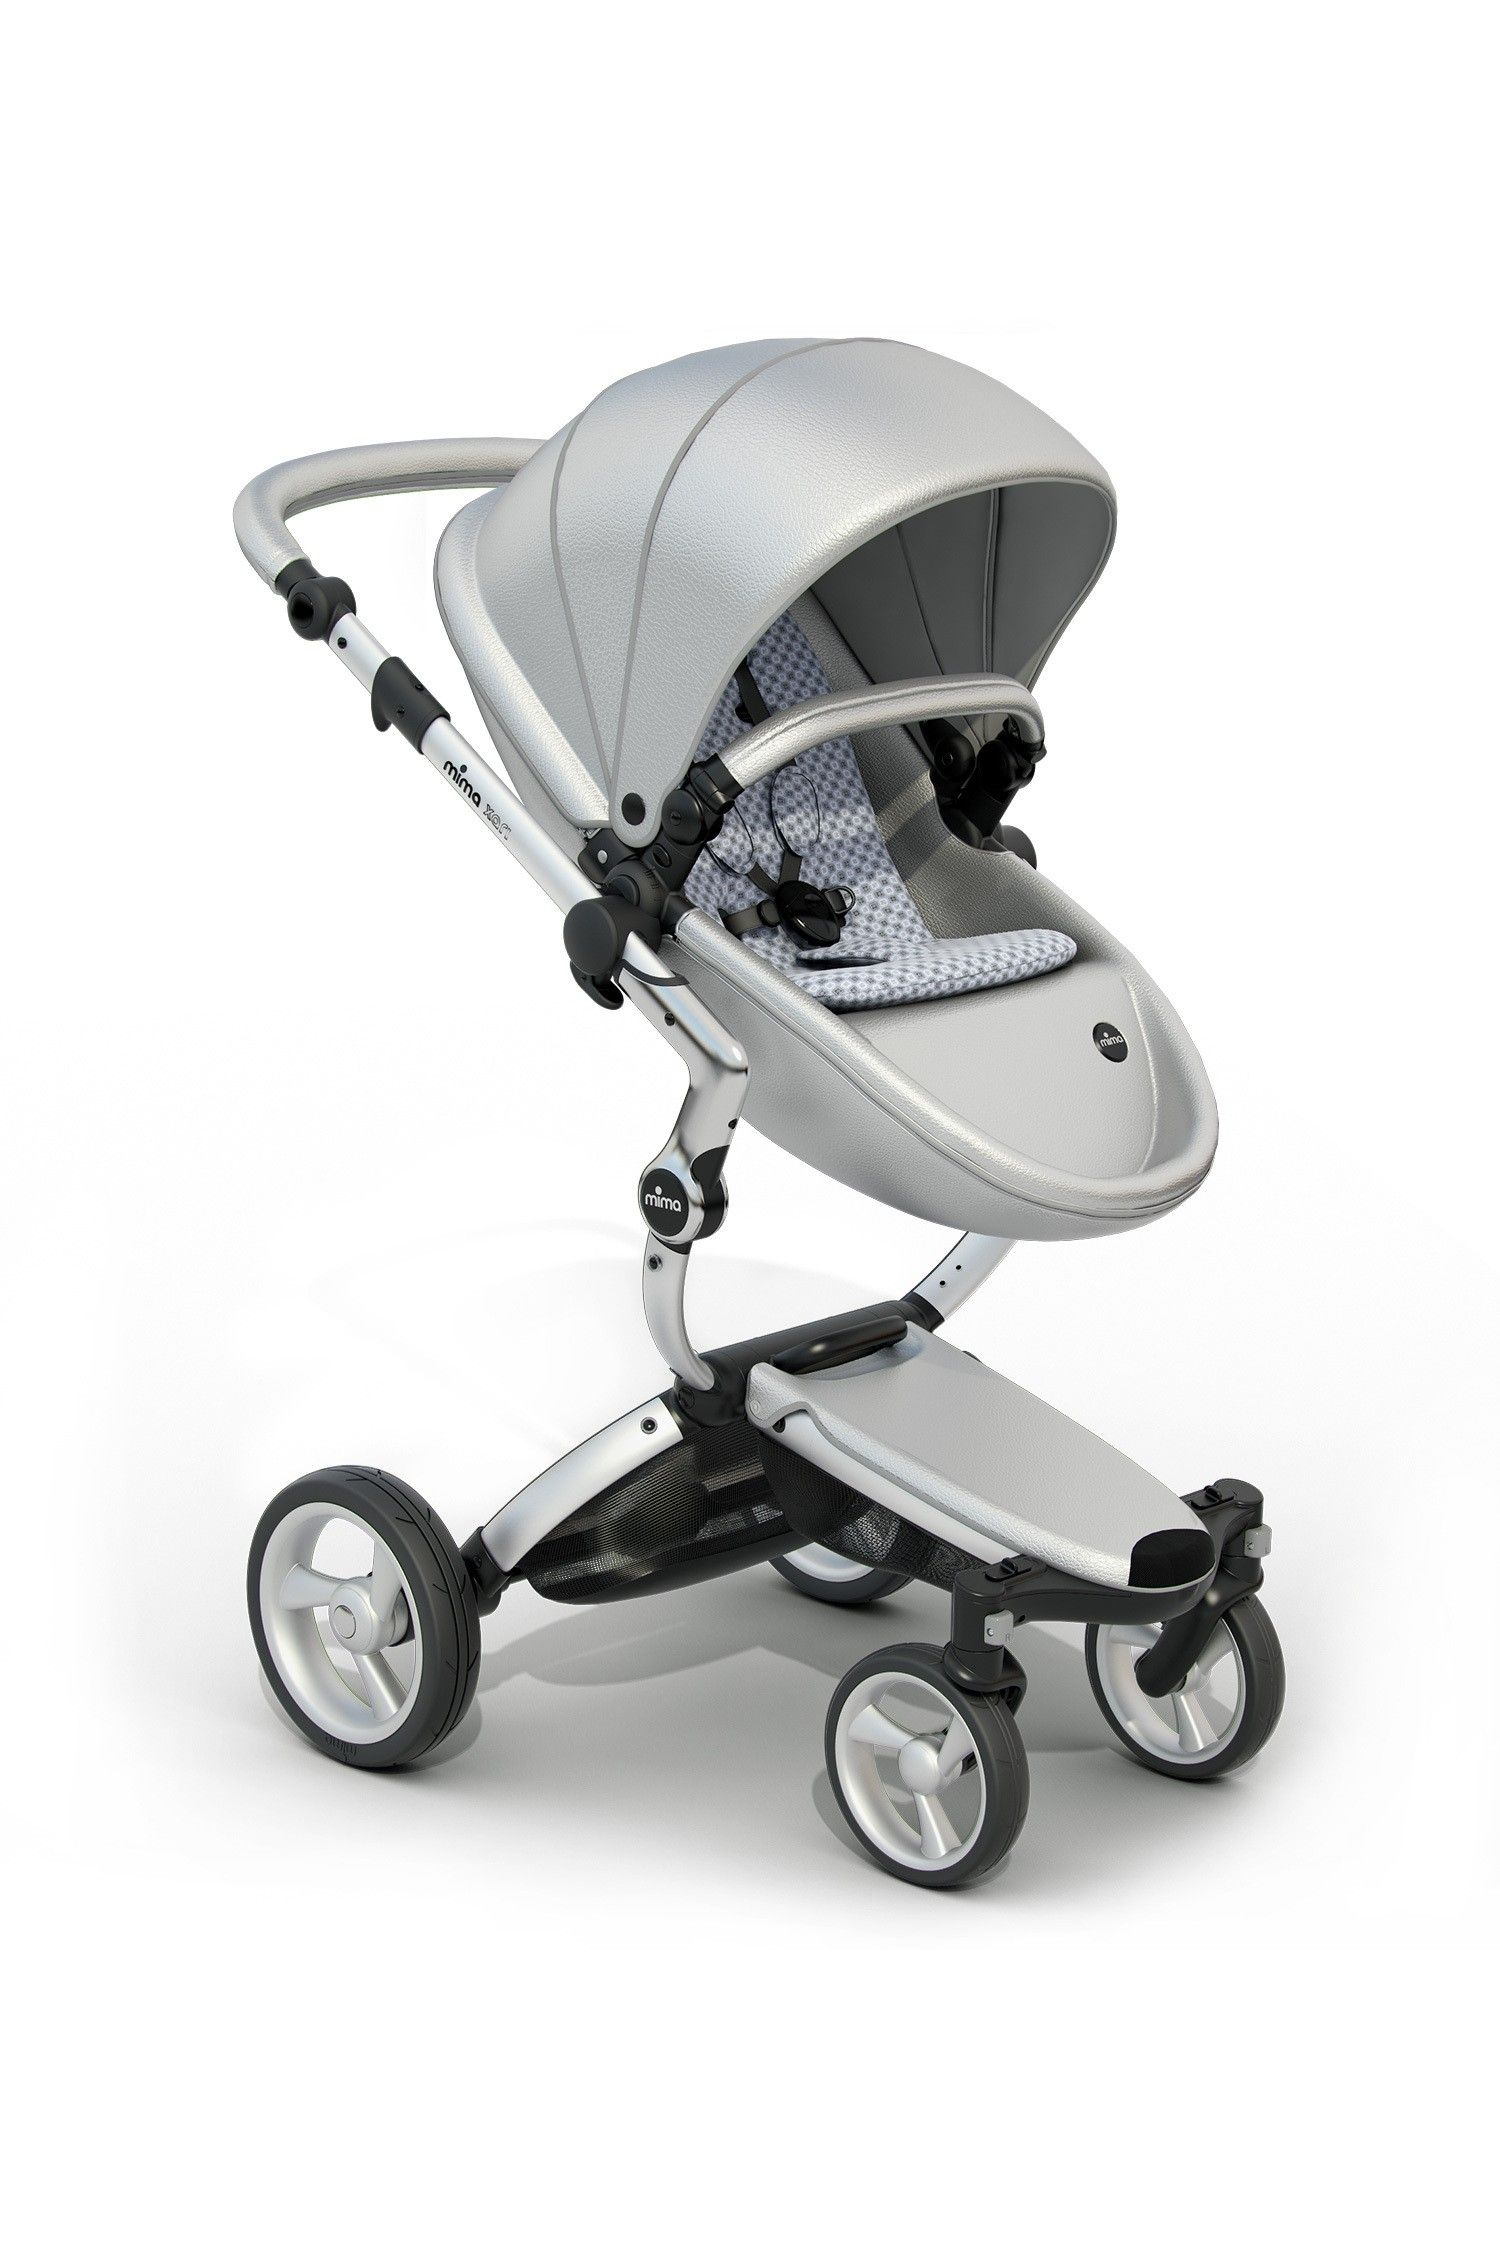 13++ Mima stroller for sale egypt info